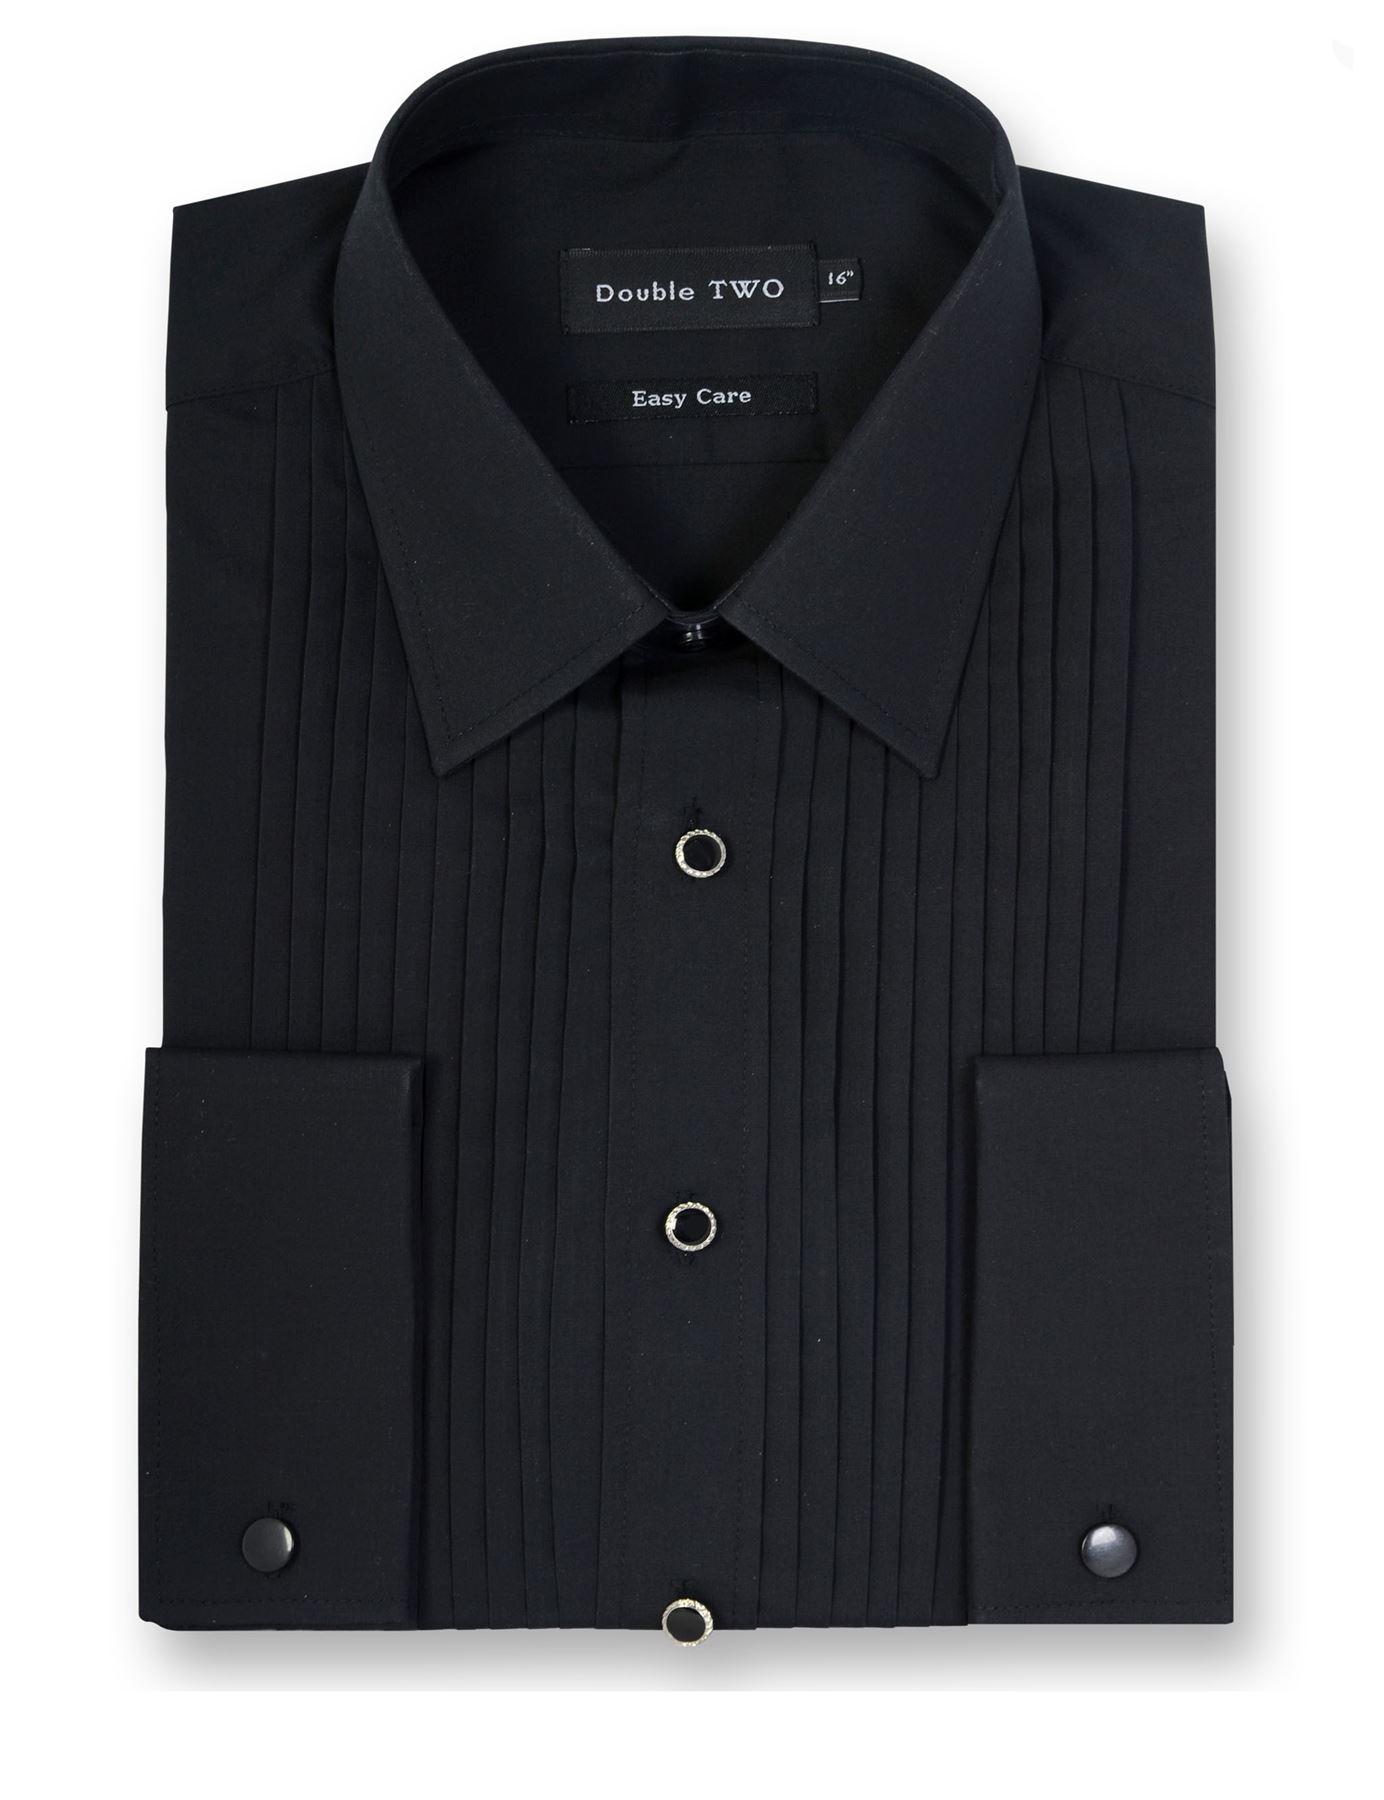 5002 DOUBLE TWO Stitch Pleat dress shirt